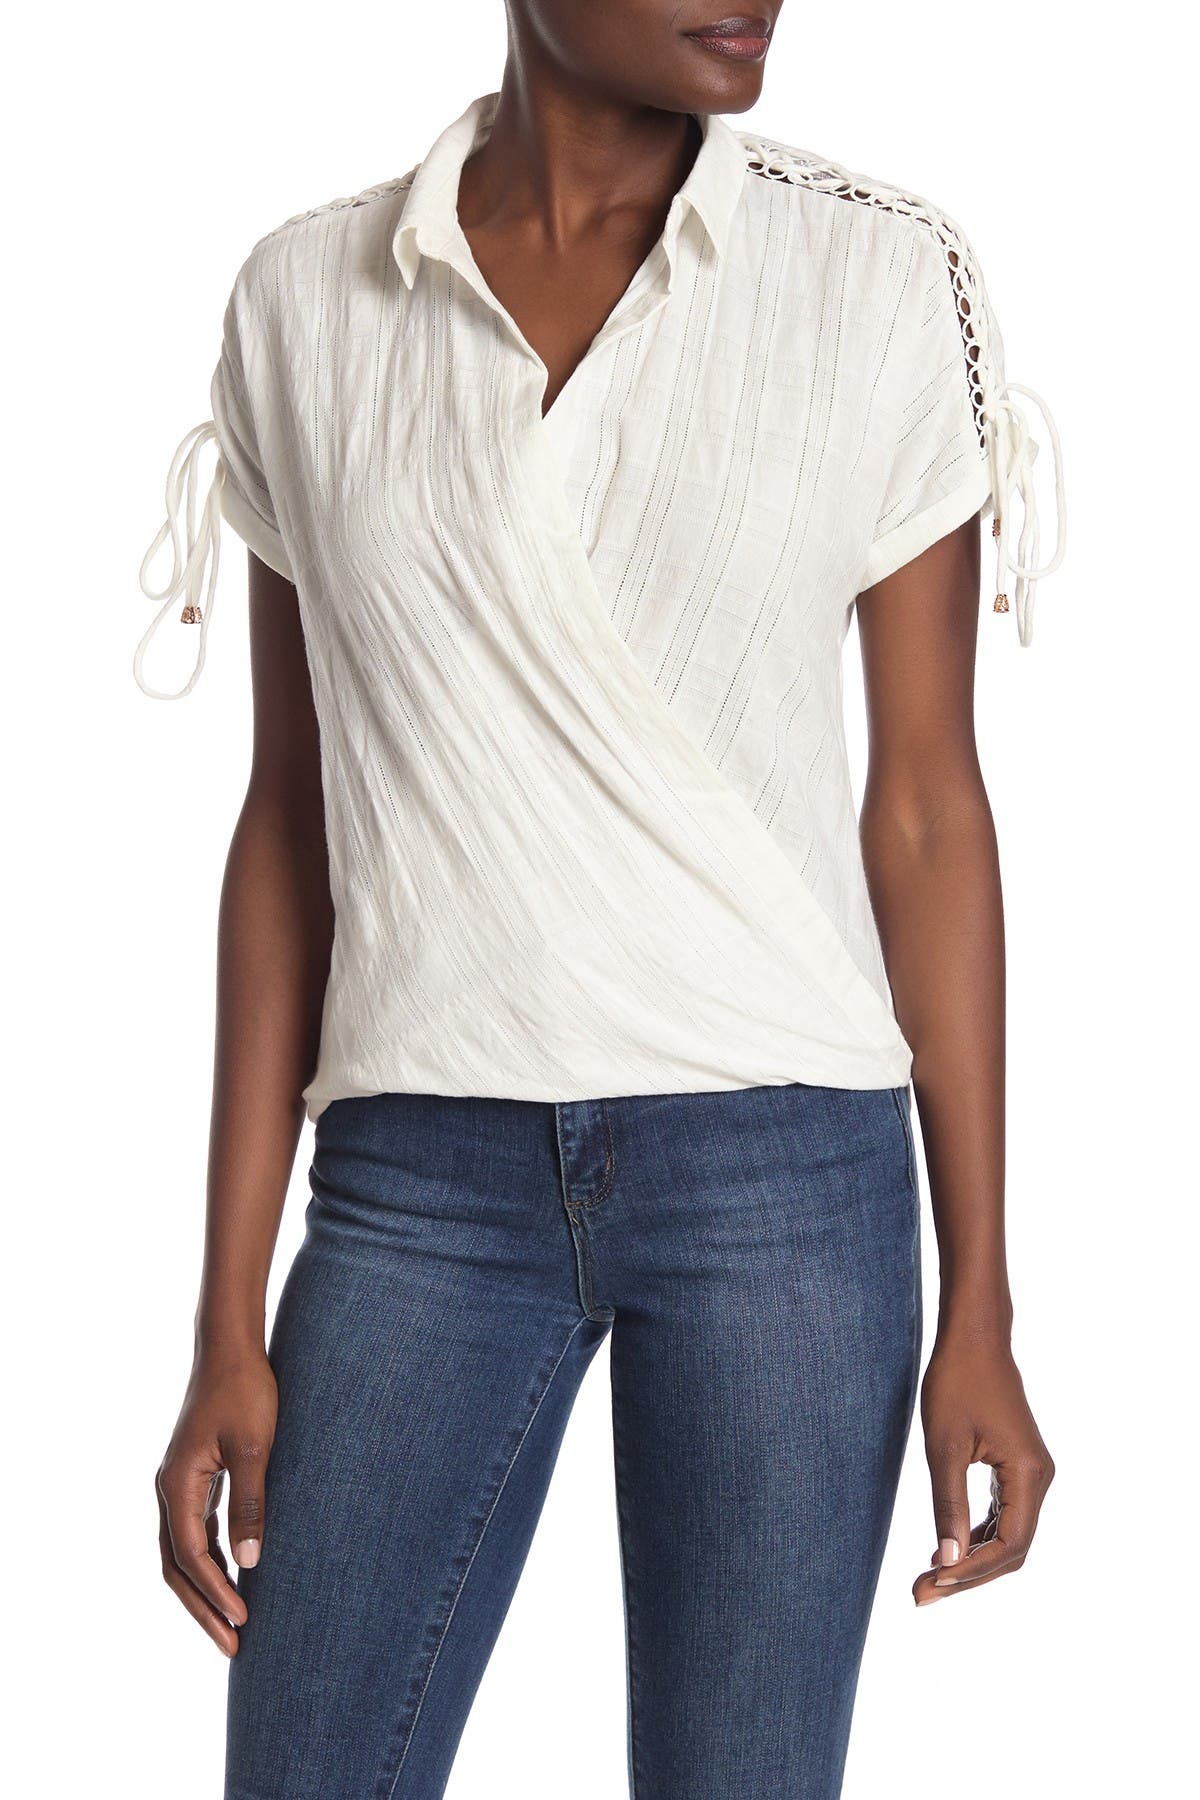 Image of Heartloom Kiki Lace-Up Short Sleeve Surplice Top